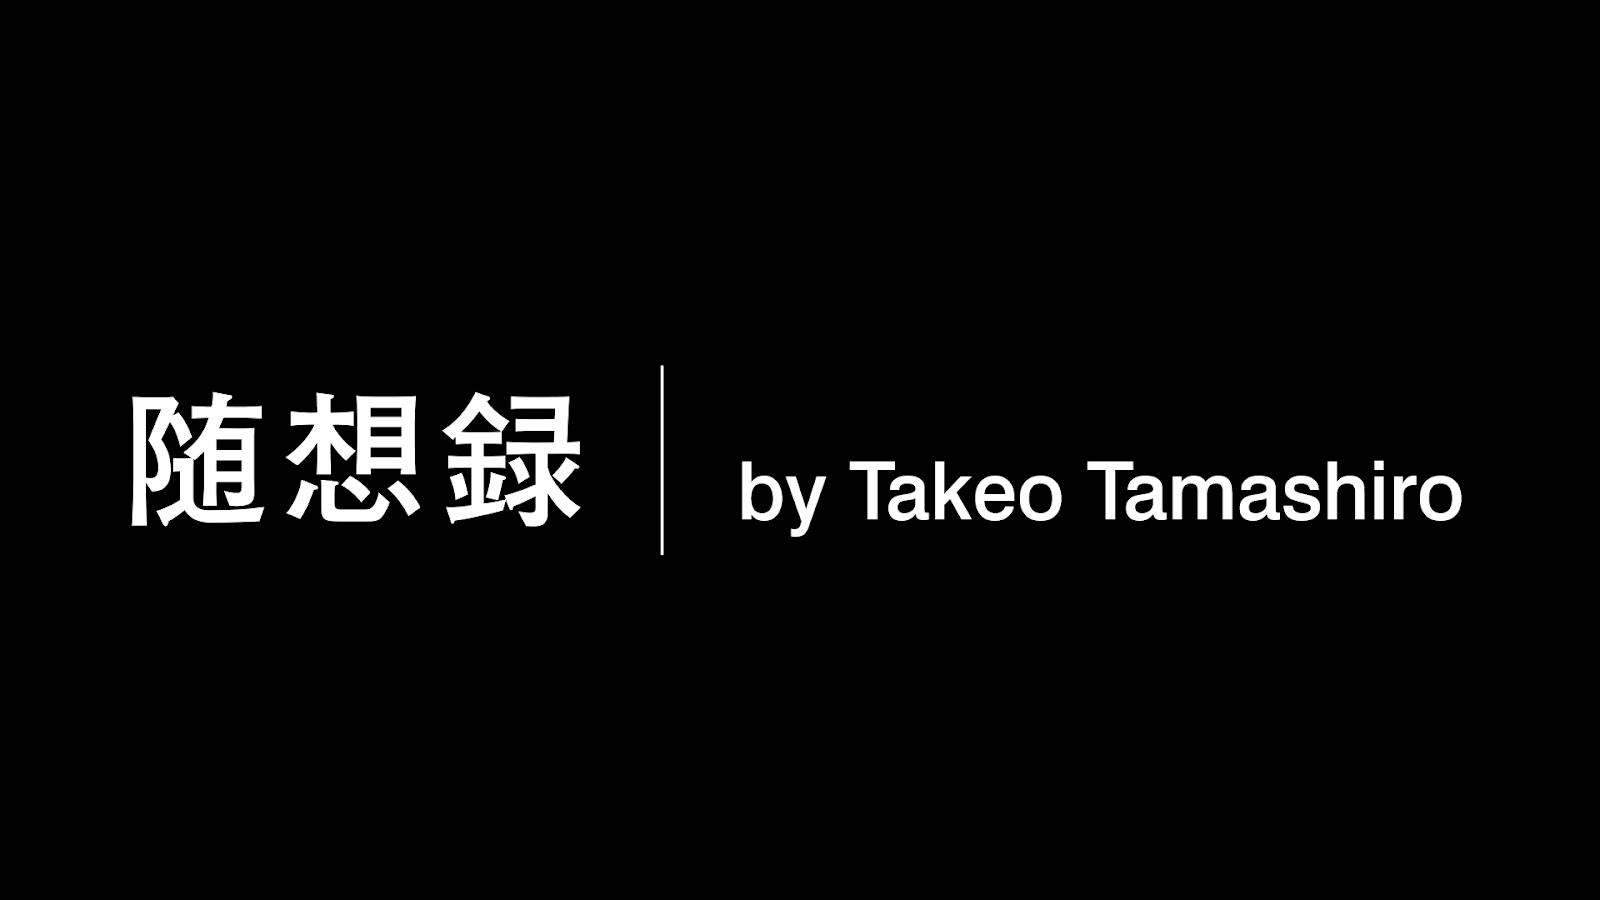 https://ja.takeotamashiro.com